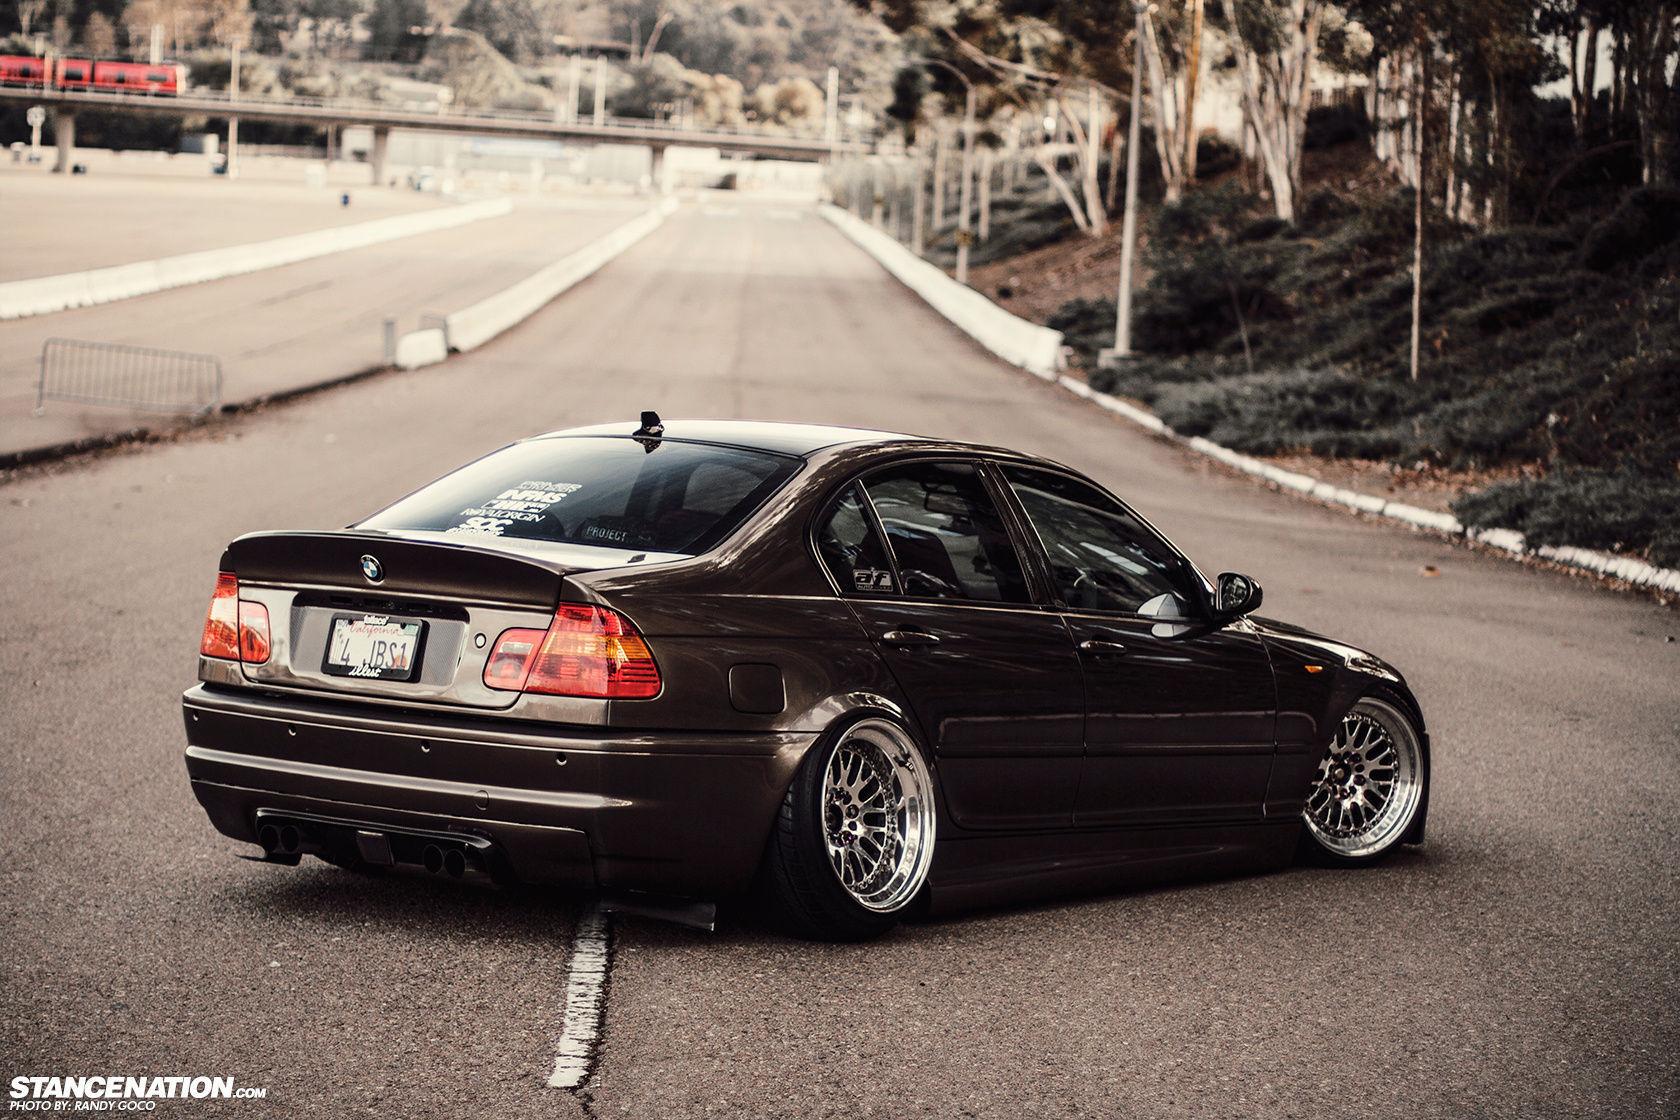 2004 BMW M3 | BMW E46 M3